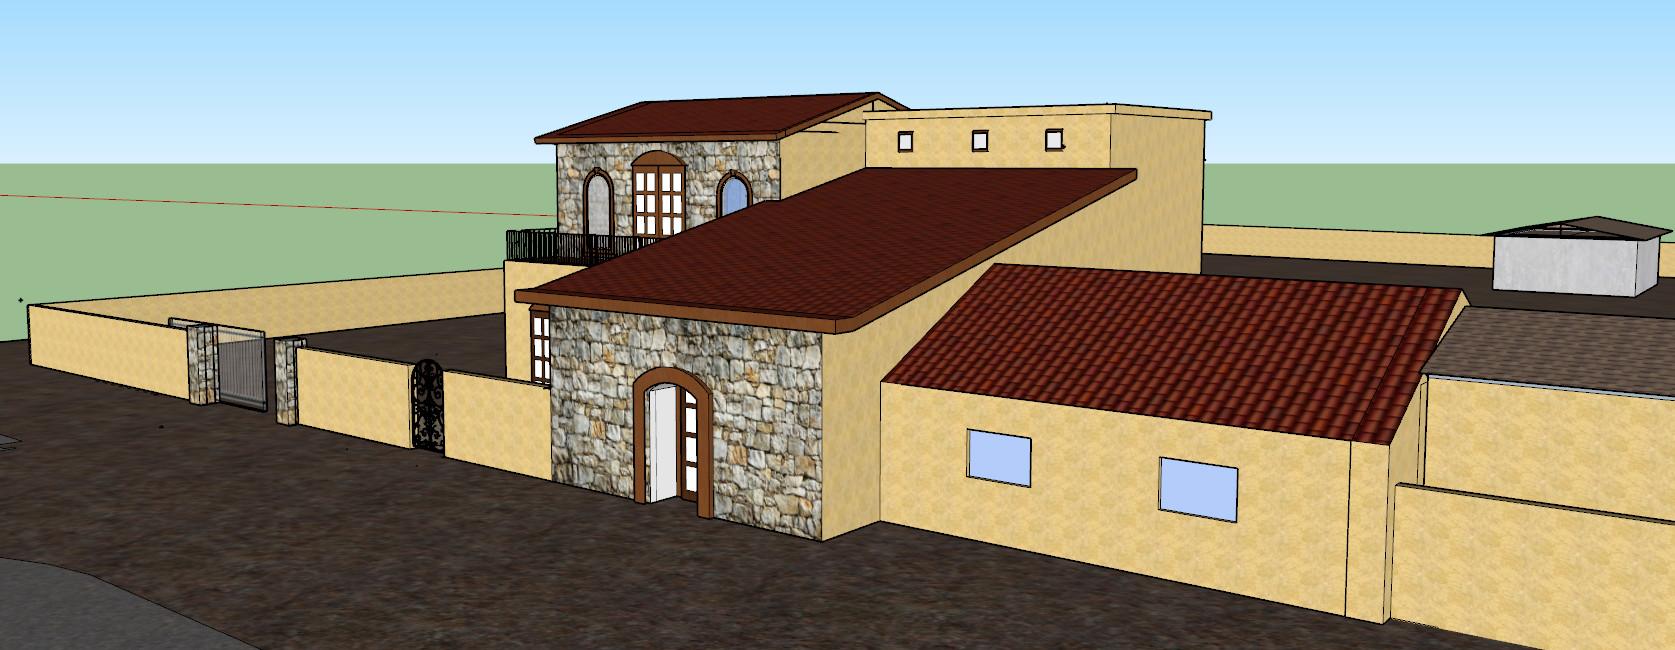 Delgarbino house redesign